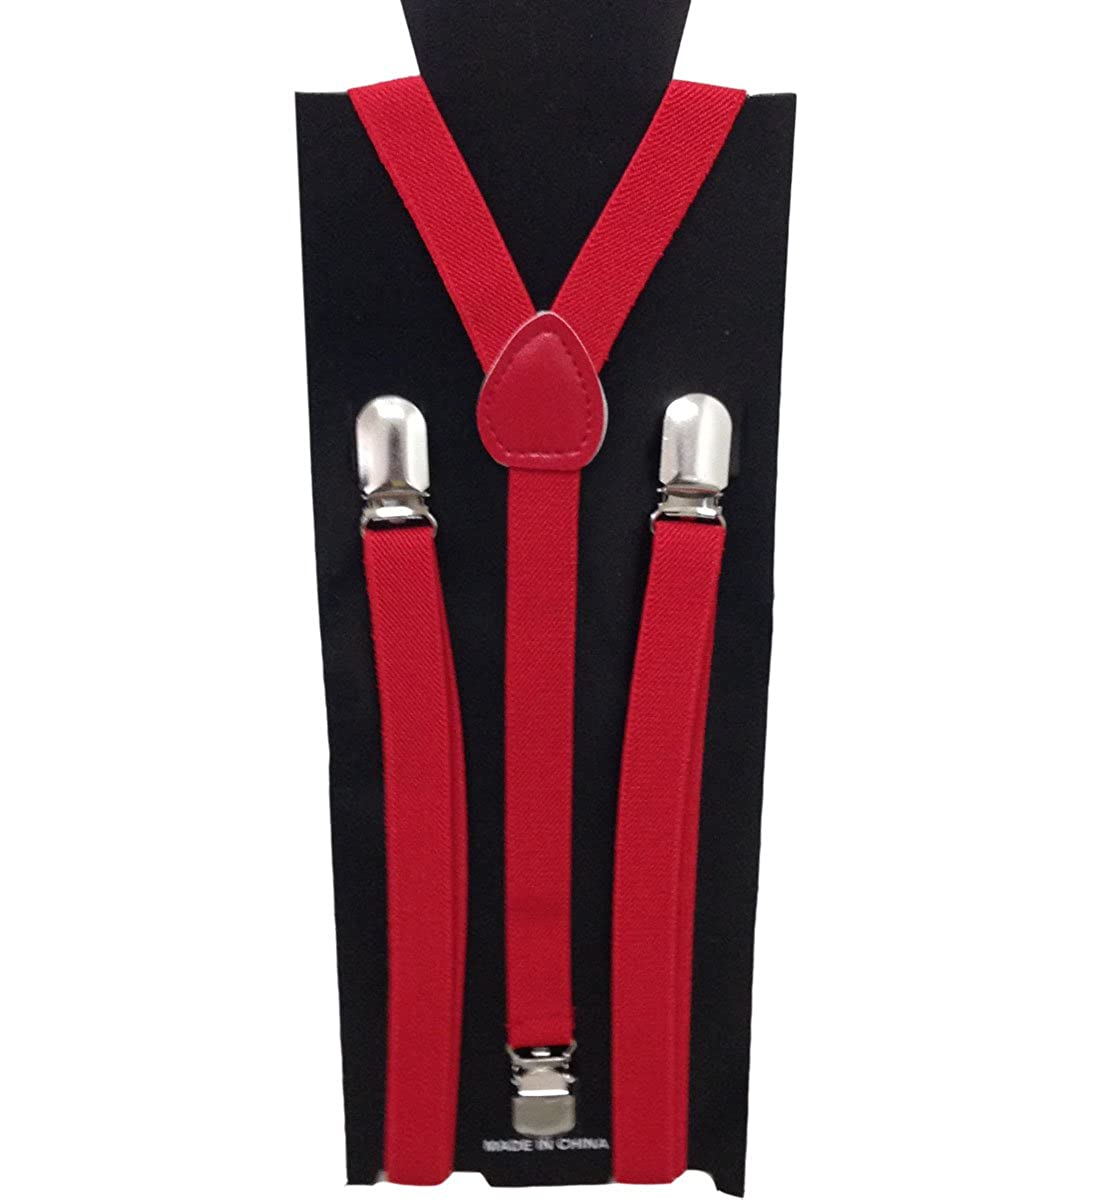 JTC Child Kid Adjustable Elastic Suspenders Solid Color Y Back Red